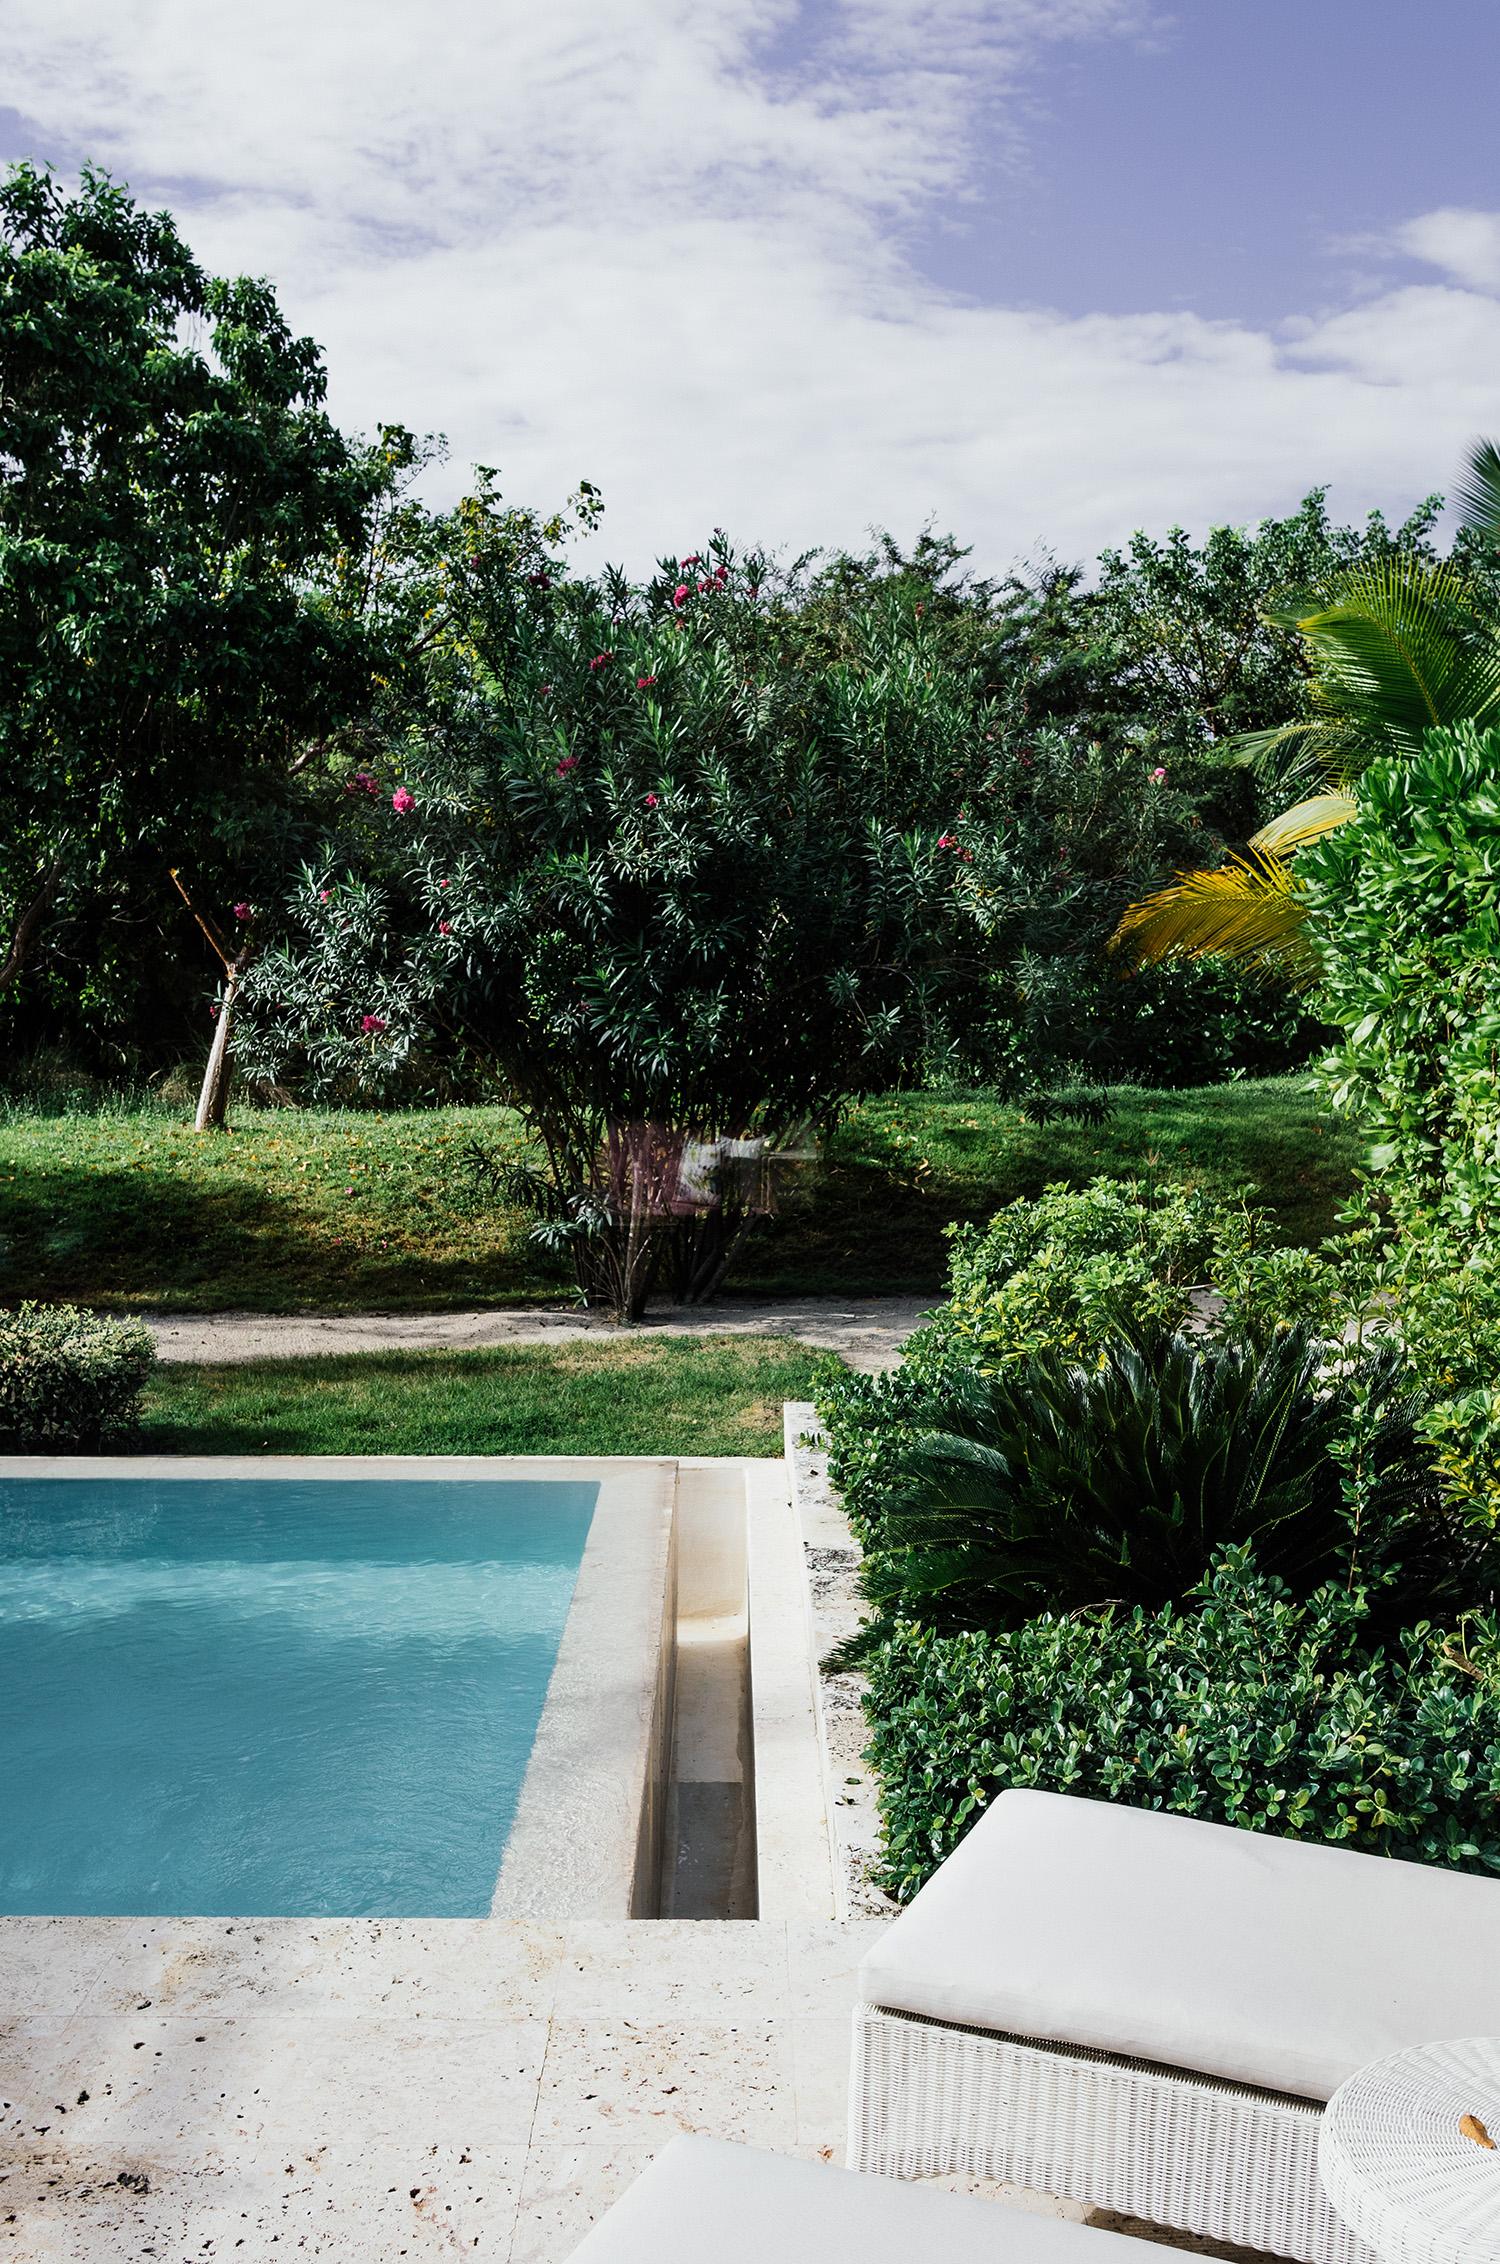 Our Junior Suite w/ private pool